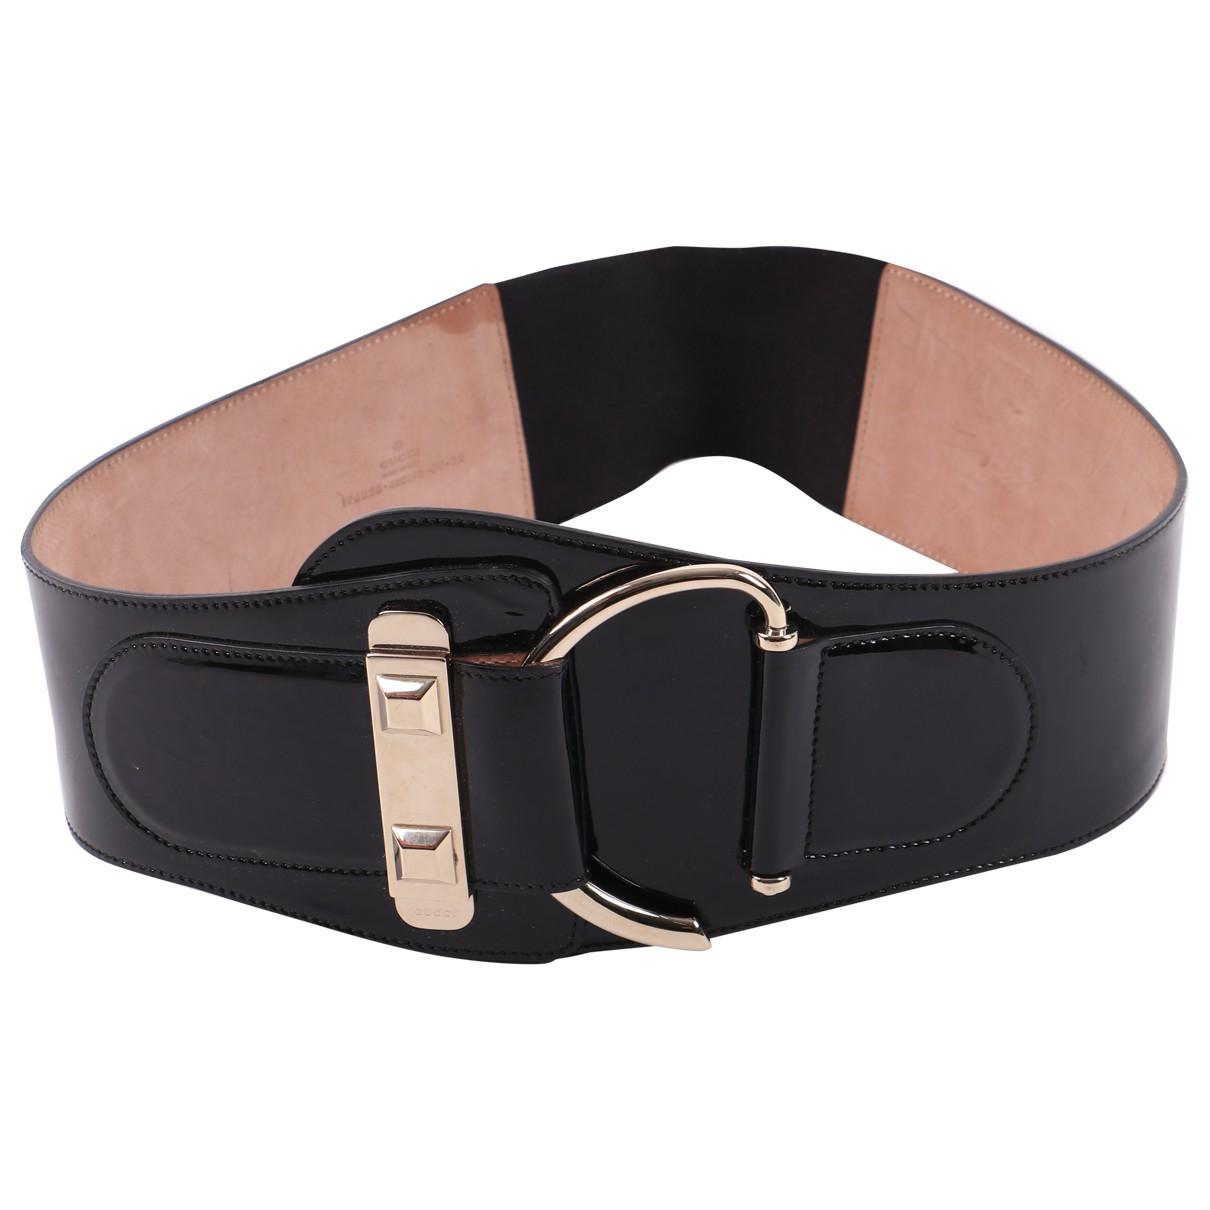 Cinturon de Charol Gucci